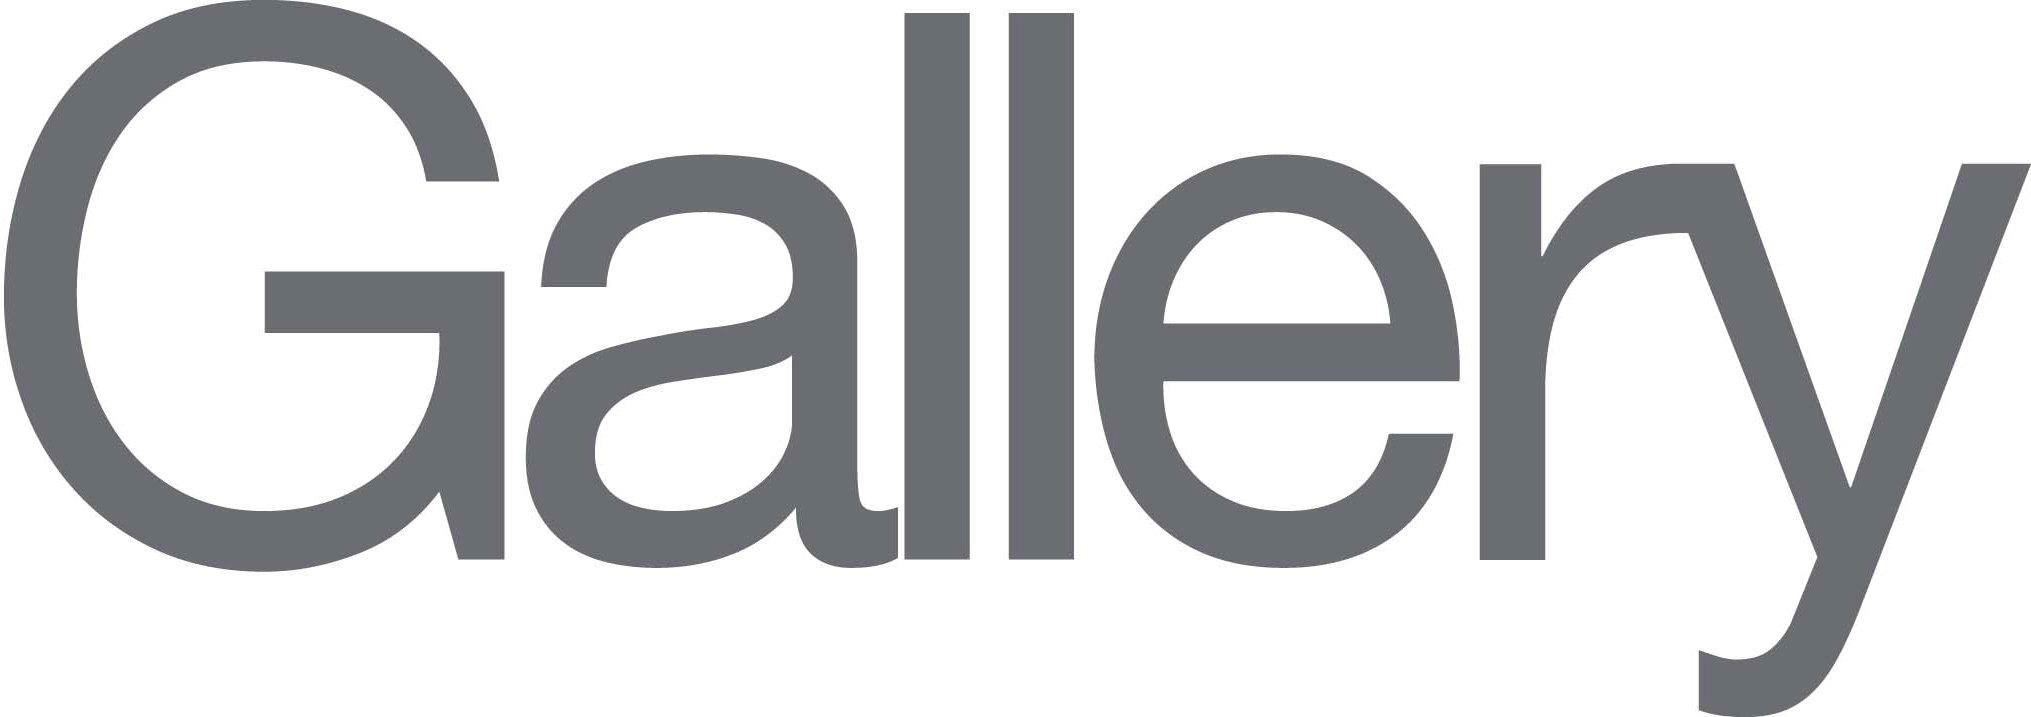 thegallery-logo